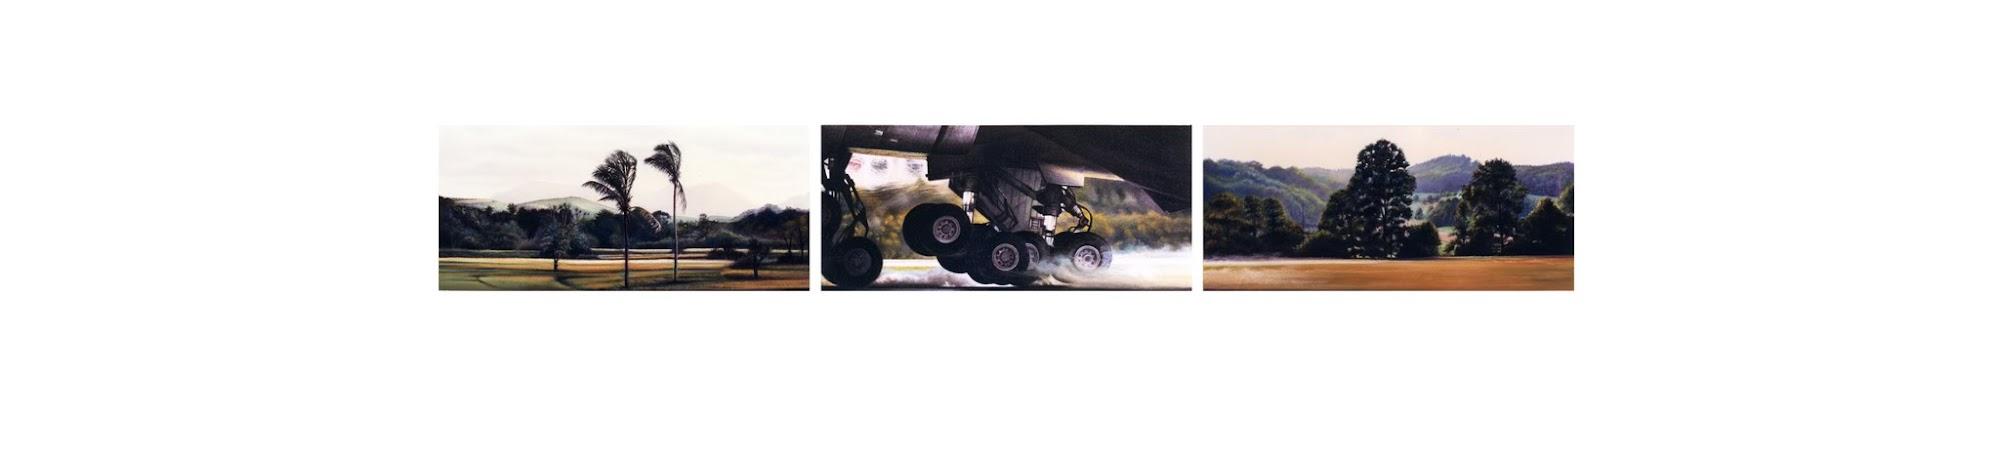 Landschaftung   1986   Aquarell / Pastell auf Papier   18 x 120 cm